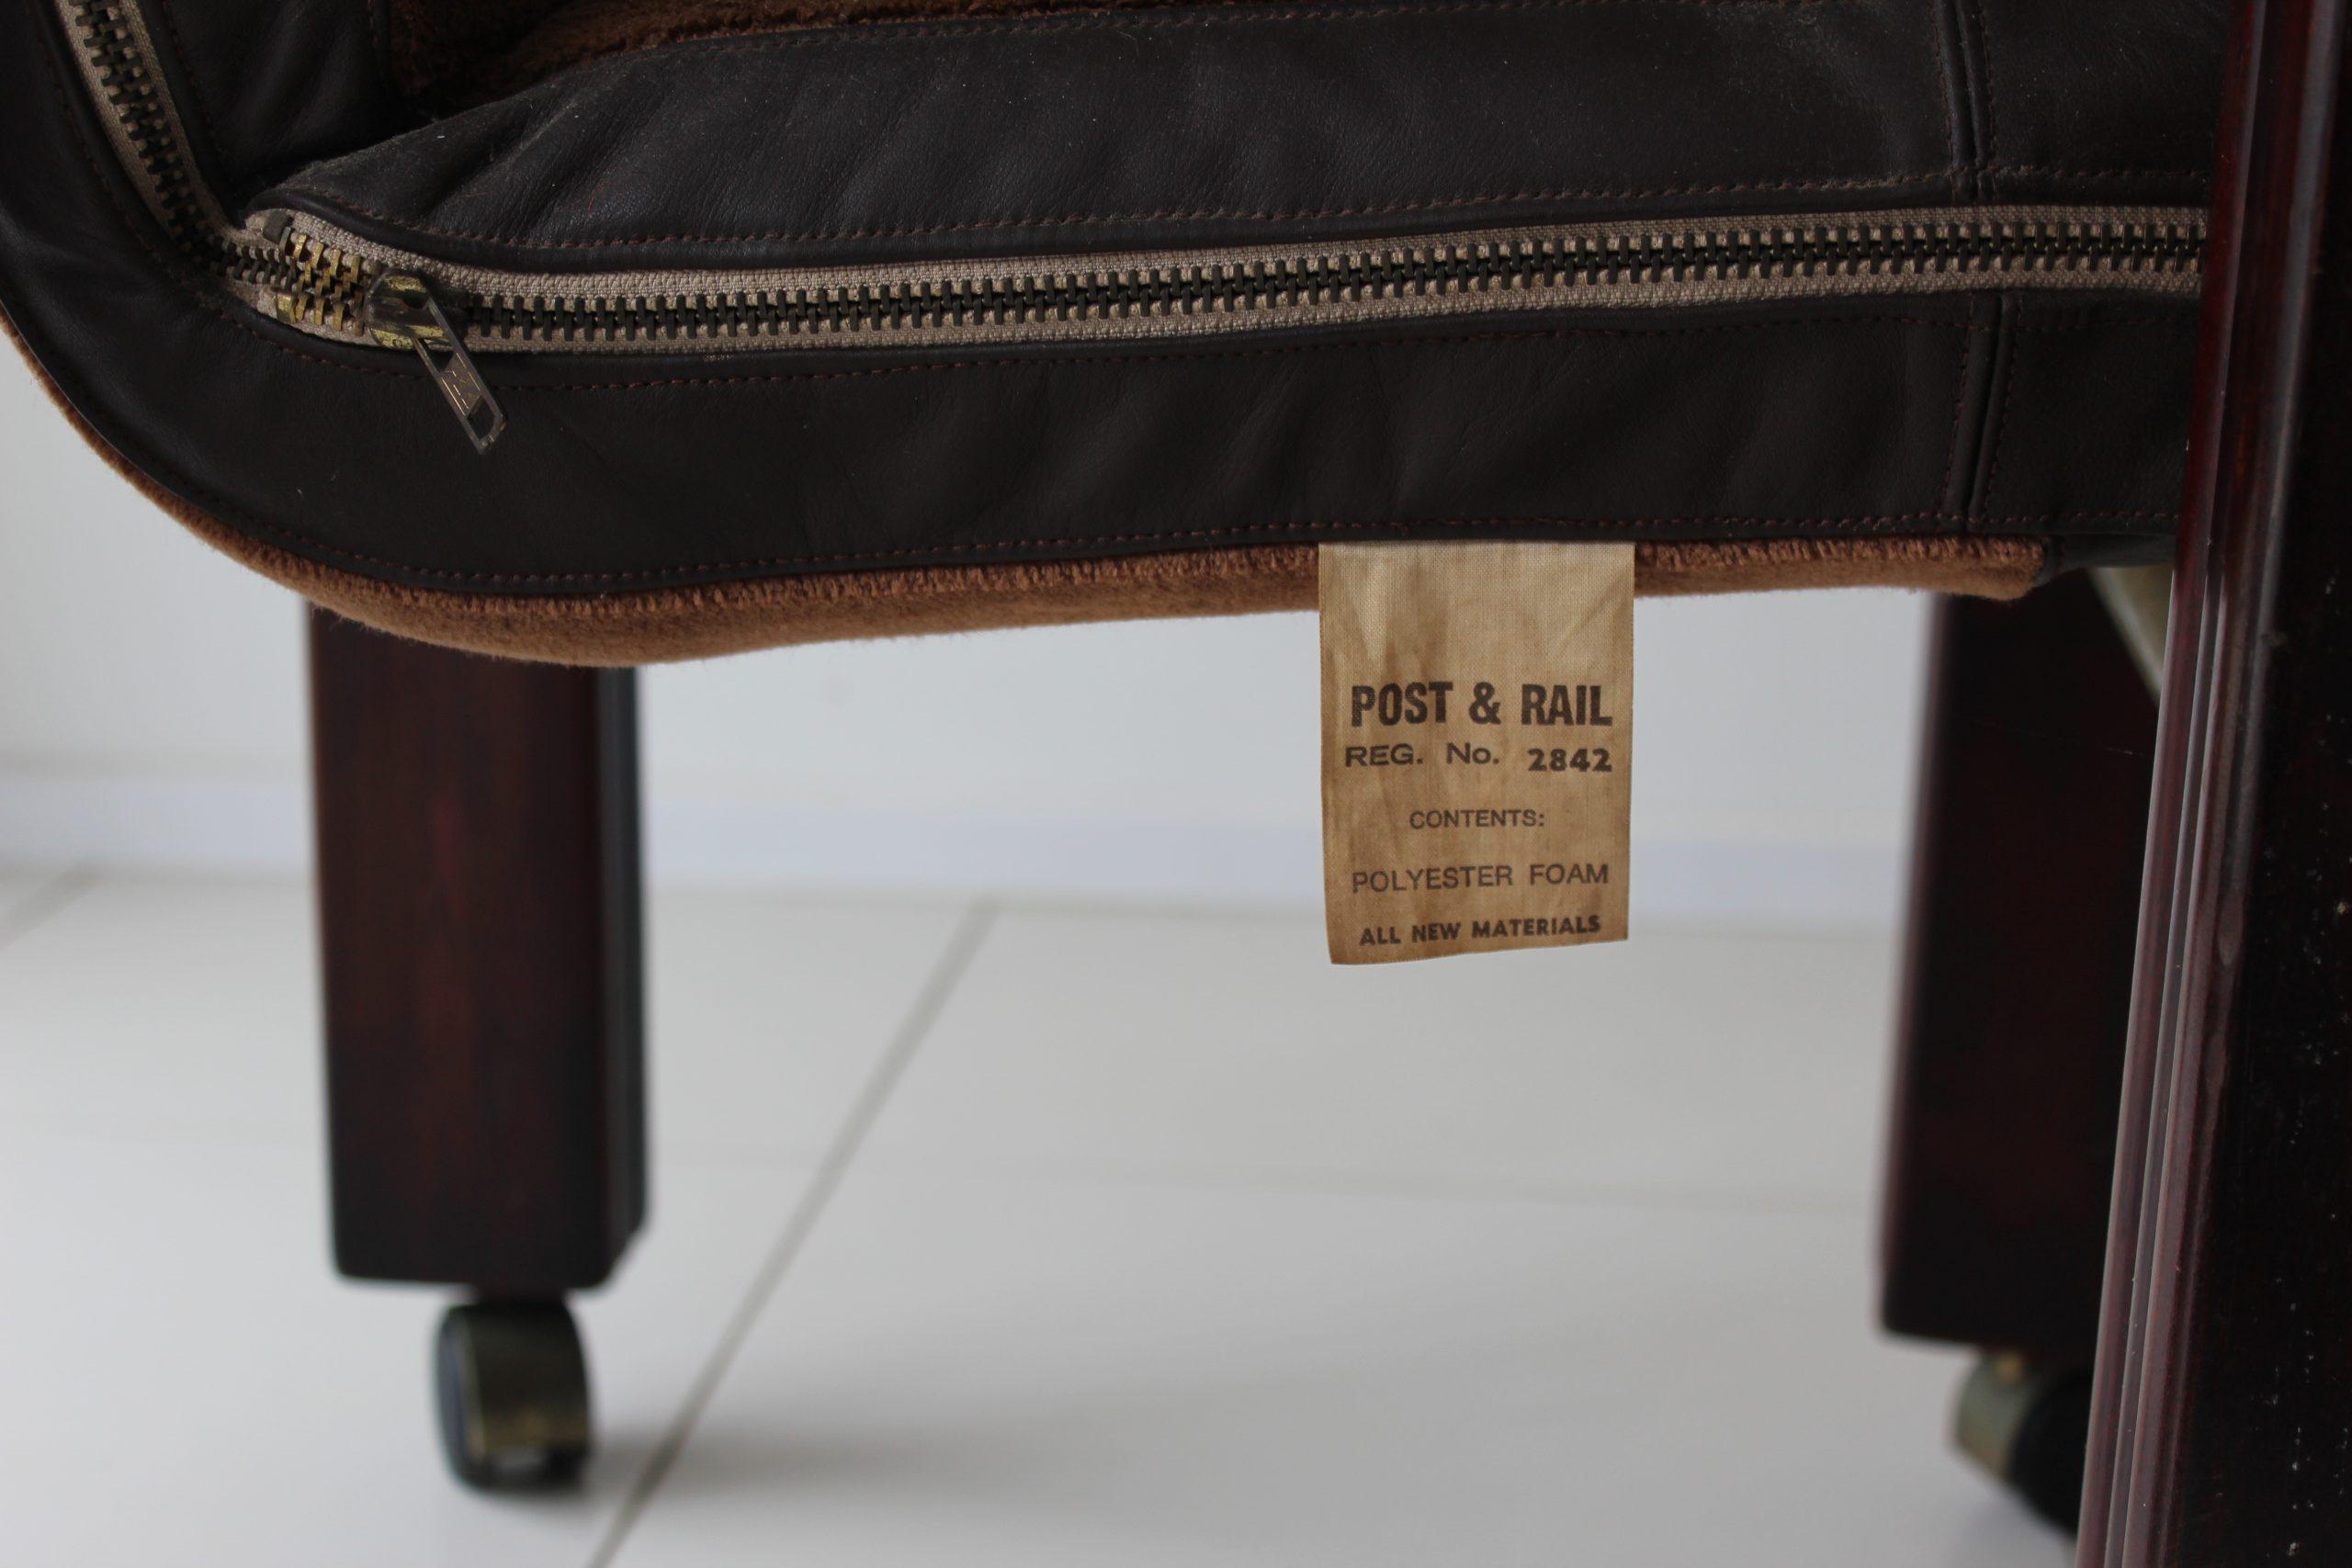 Post & Rail label